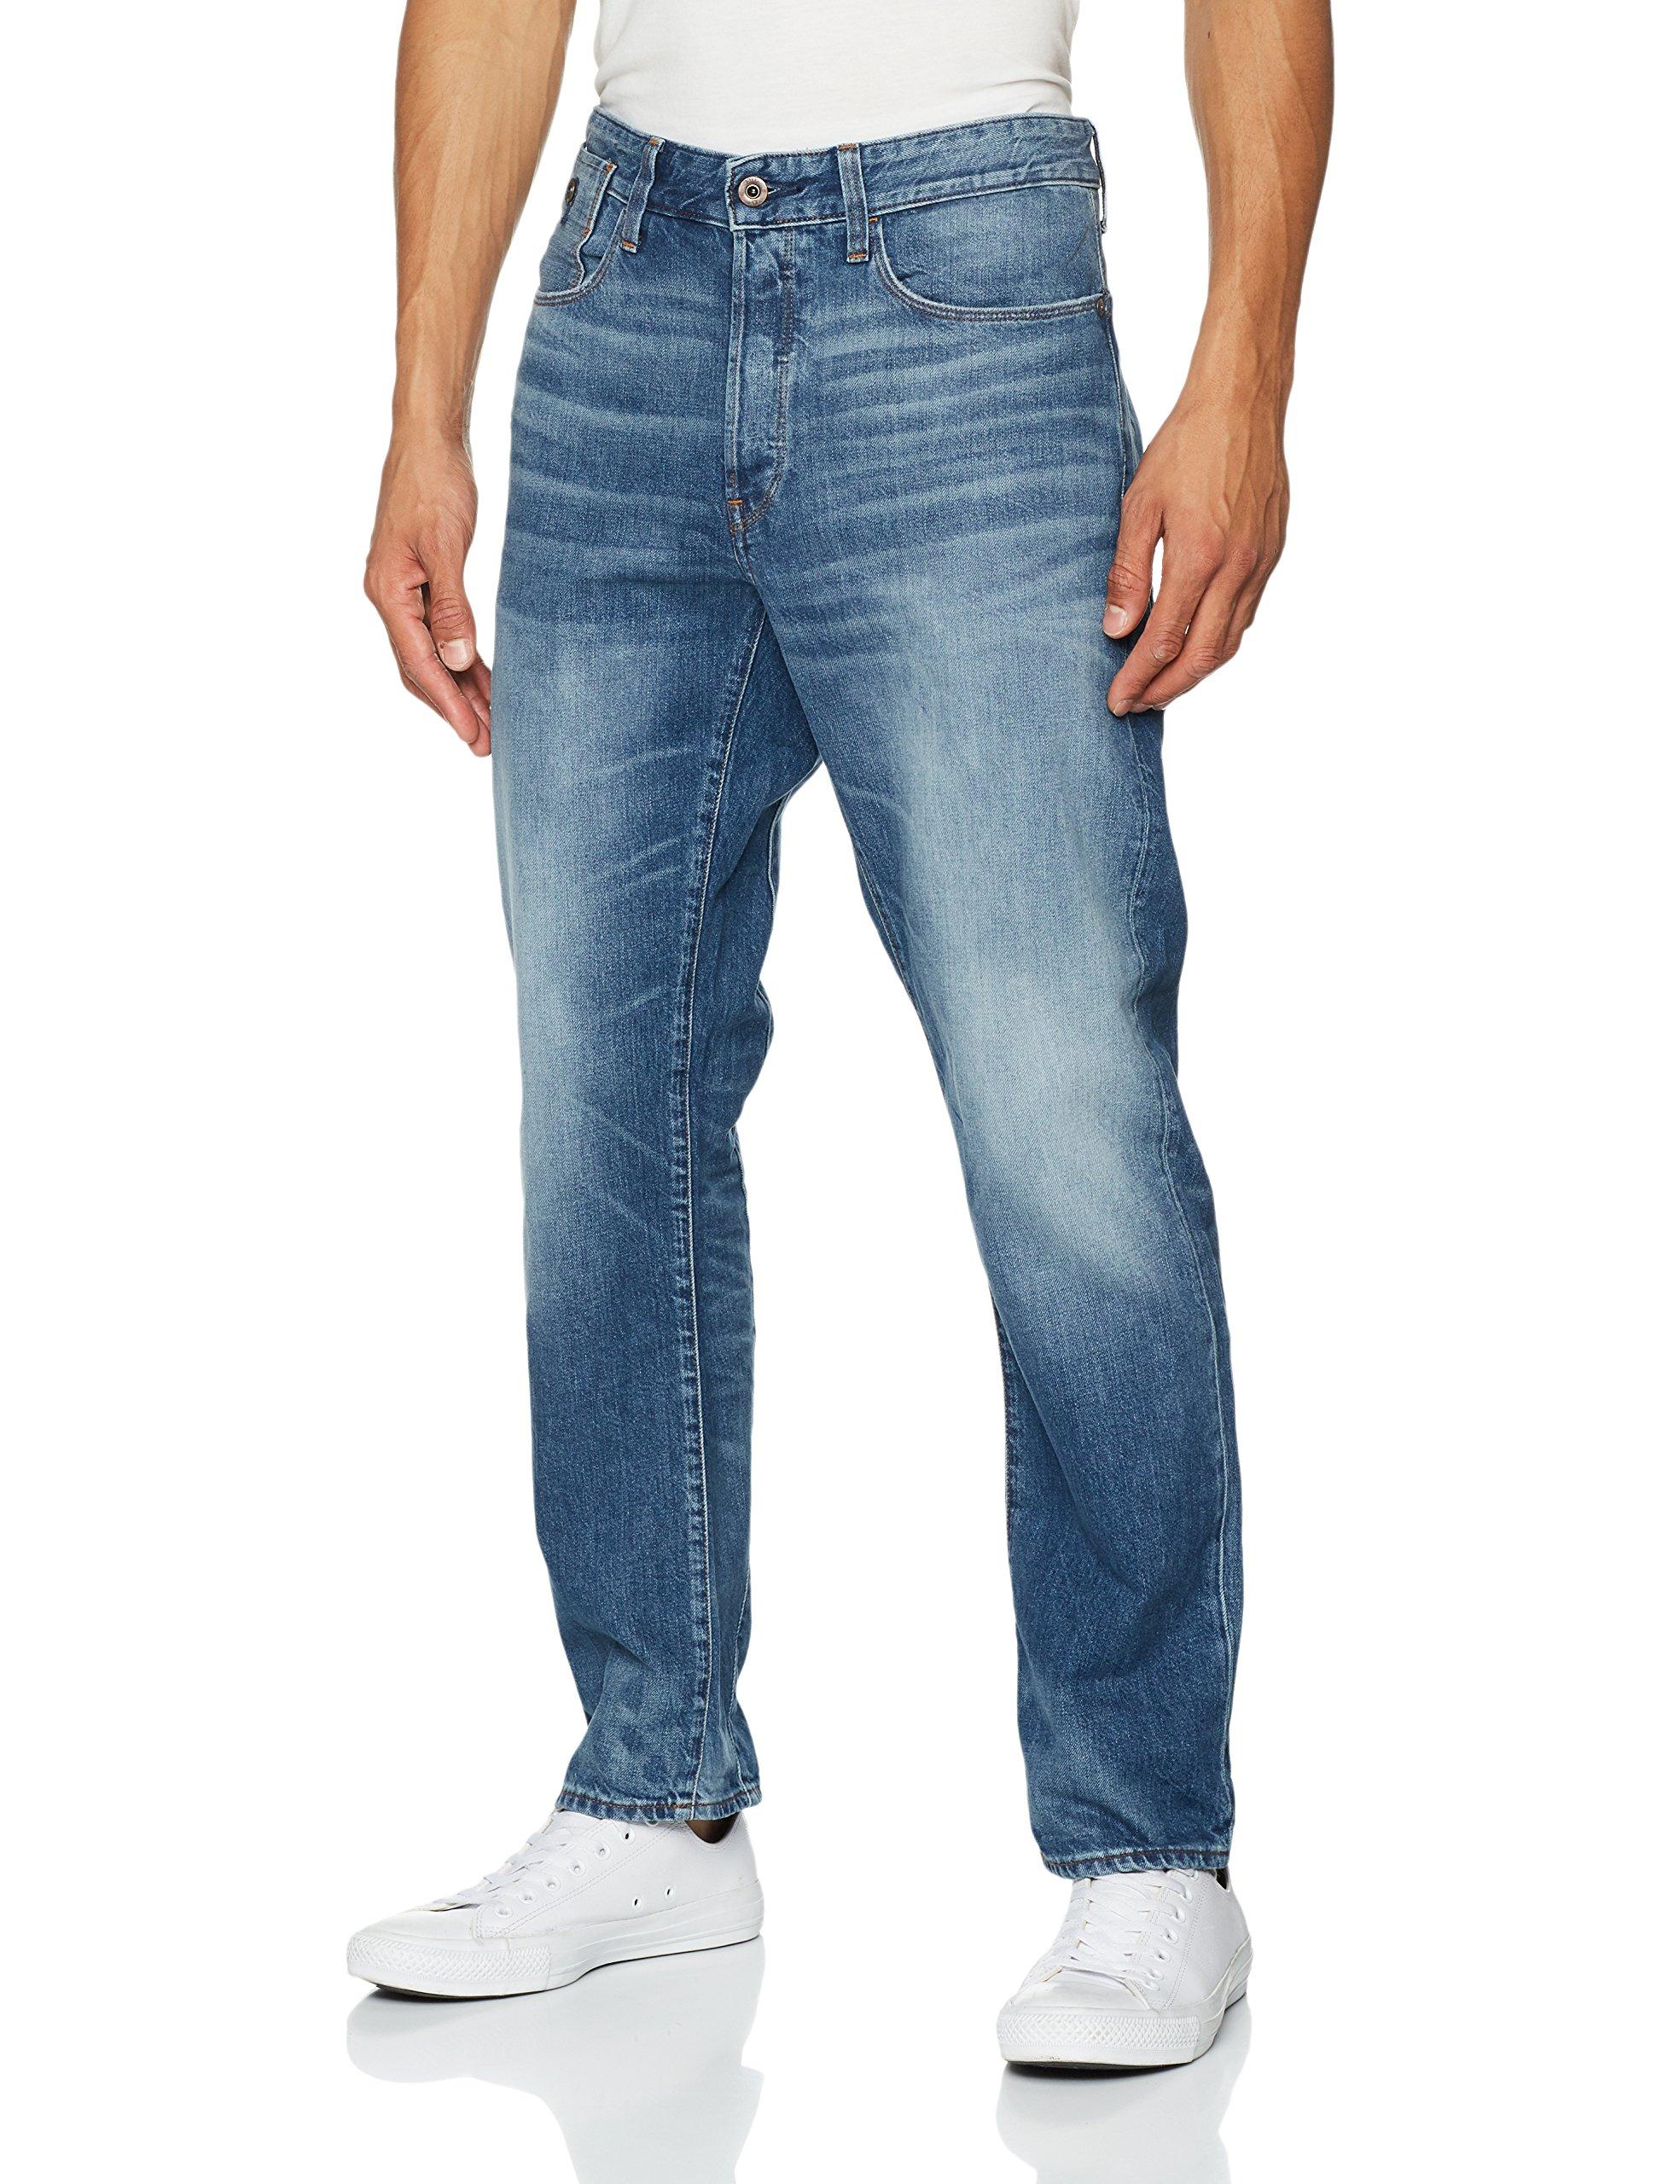 G 07129w32l Type Homme C Straight Aged 9299 3d JeansBleumedium Raw star MpzUSV